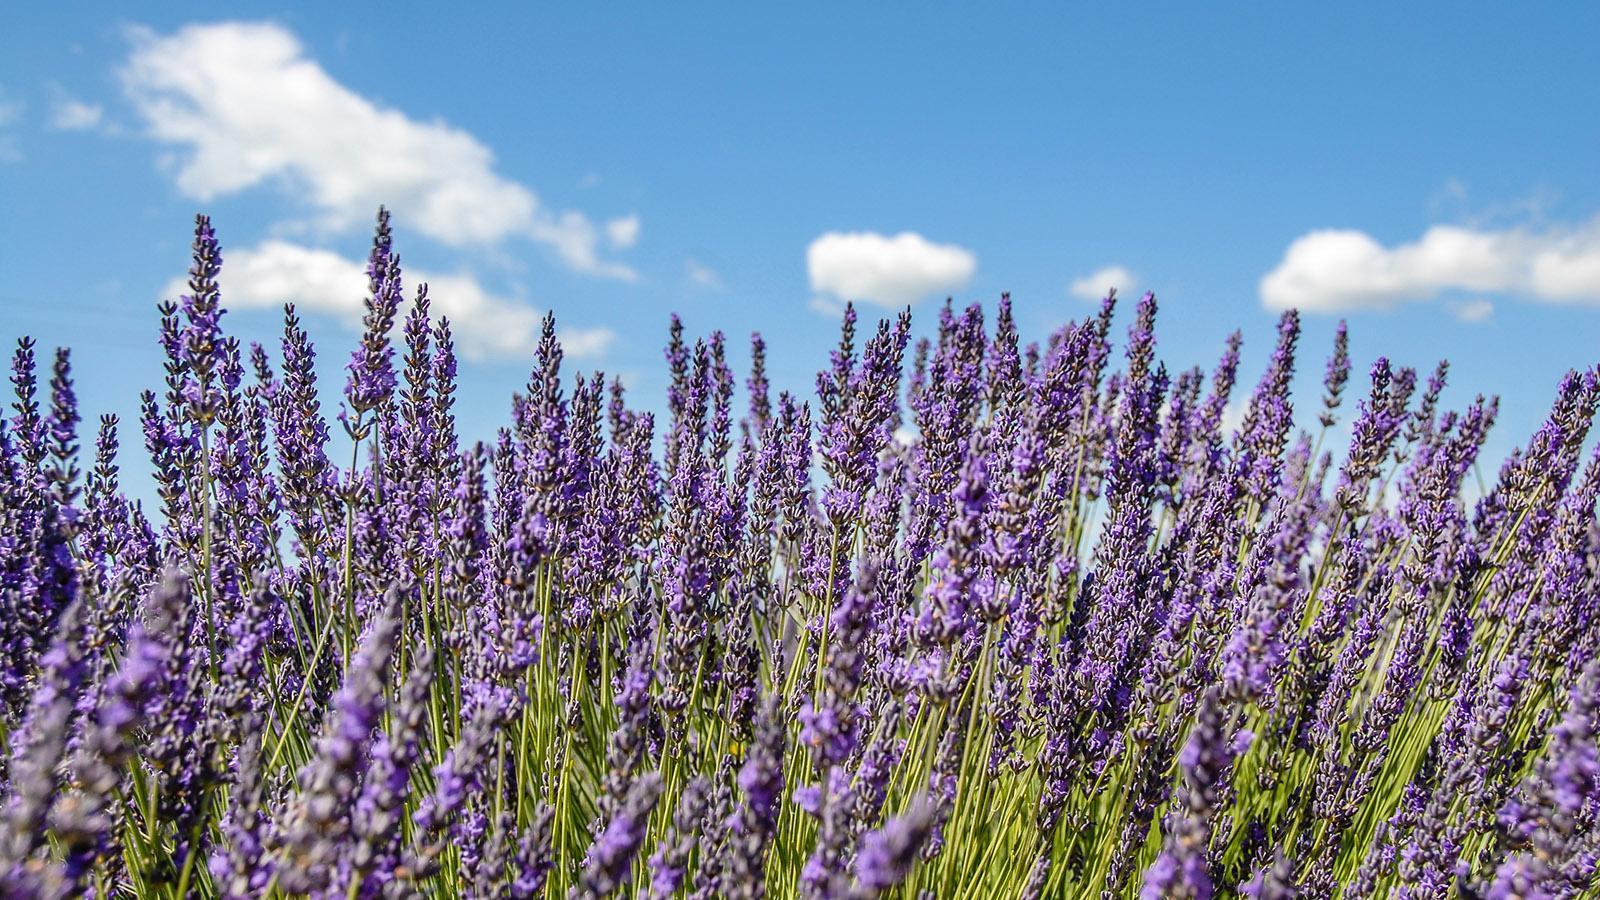 Lavendel-Anbau auf dem Plateau von Valensole. Foto: Hilke Maunder